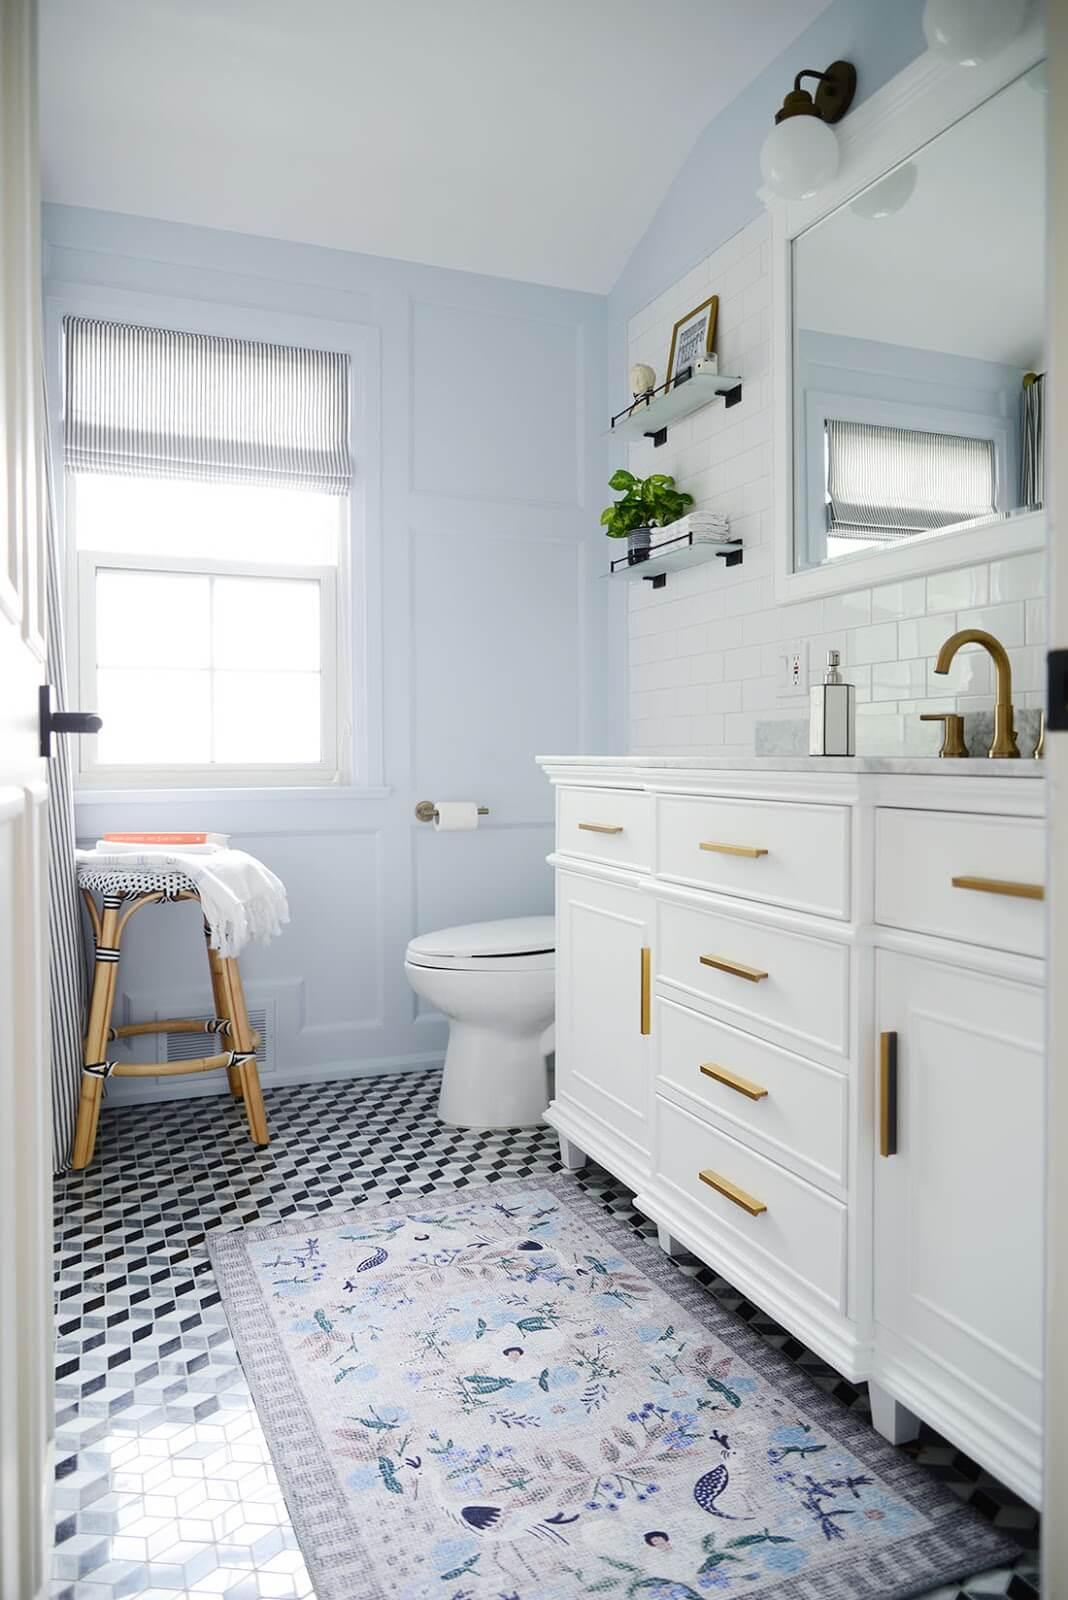 Bathroom Inspiration from Jen at Rambling Renovators